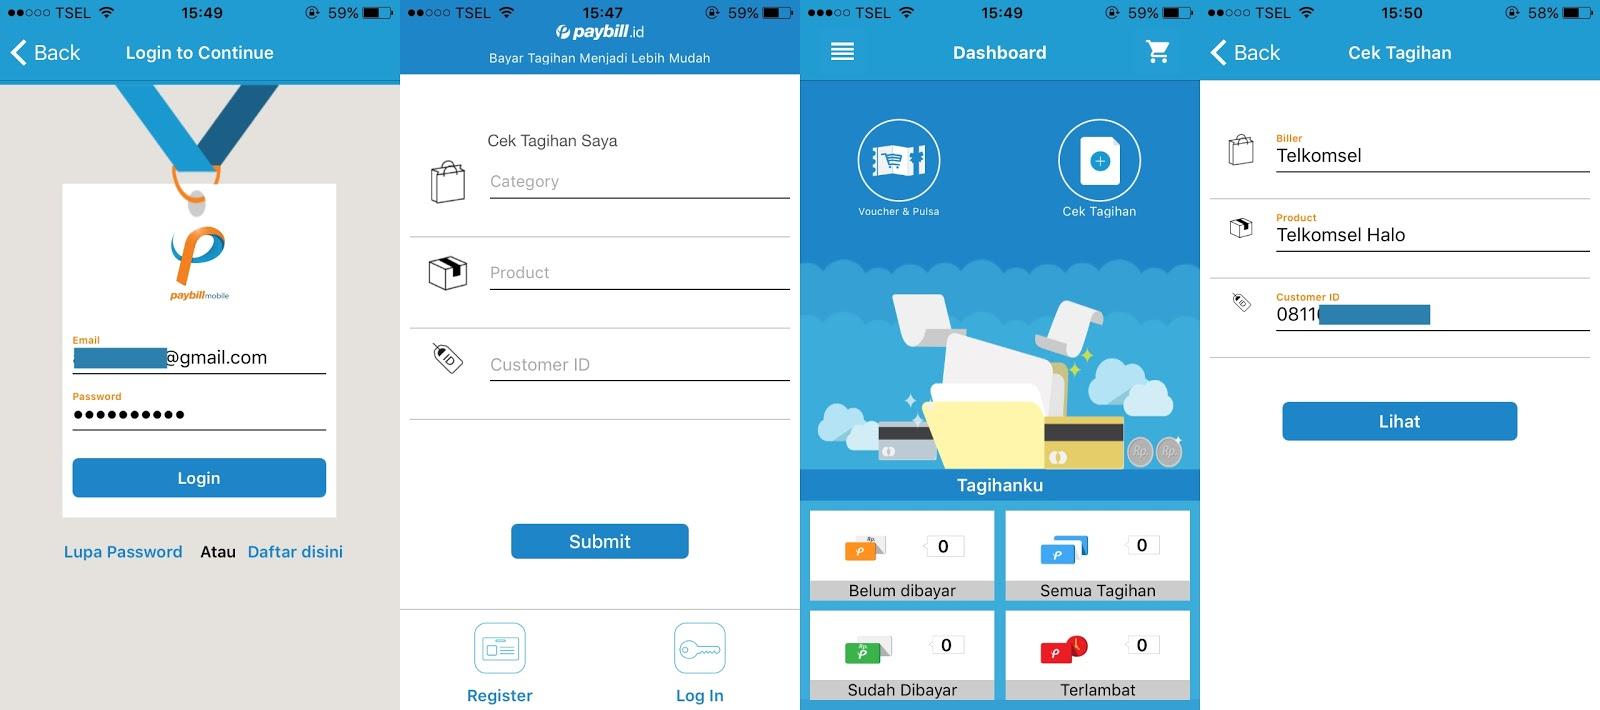 paybill%2Bios - Mau Transaksi Online Aman Tanpa Repot? Paybill Indonesia Bisa Mewujudkannya